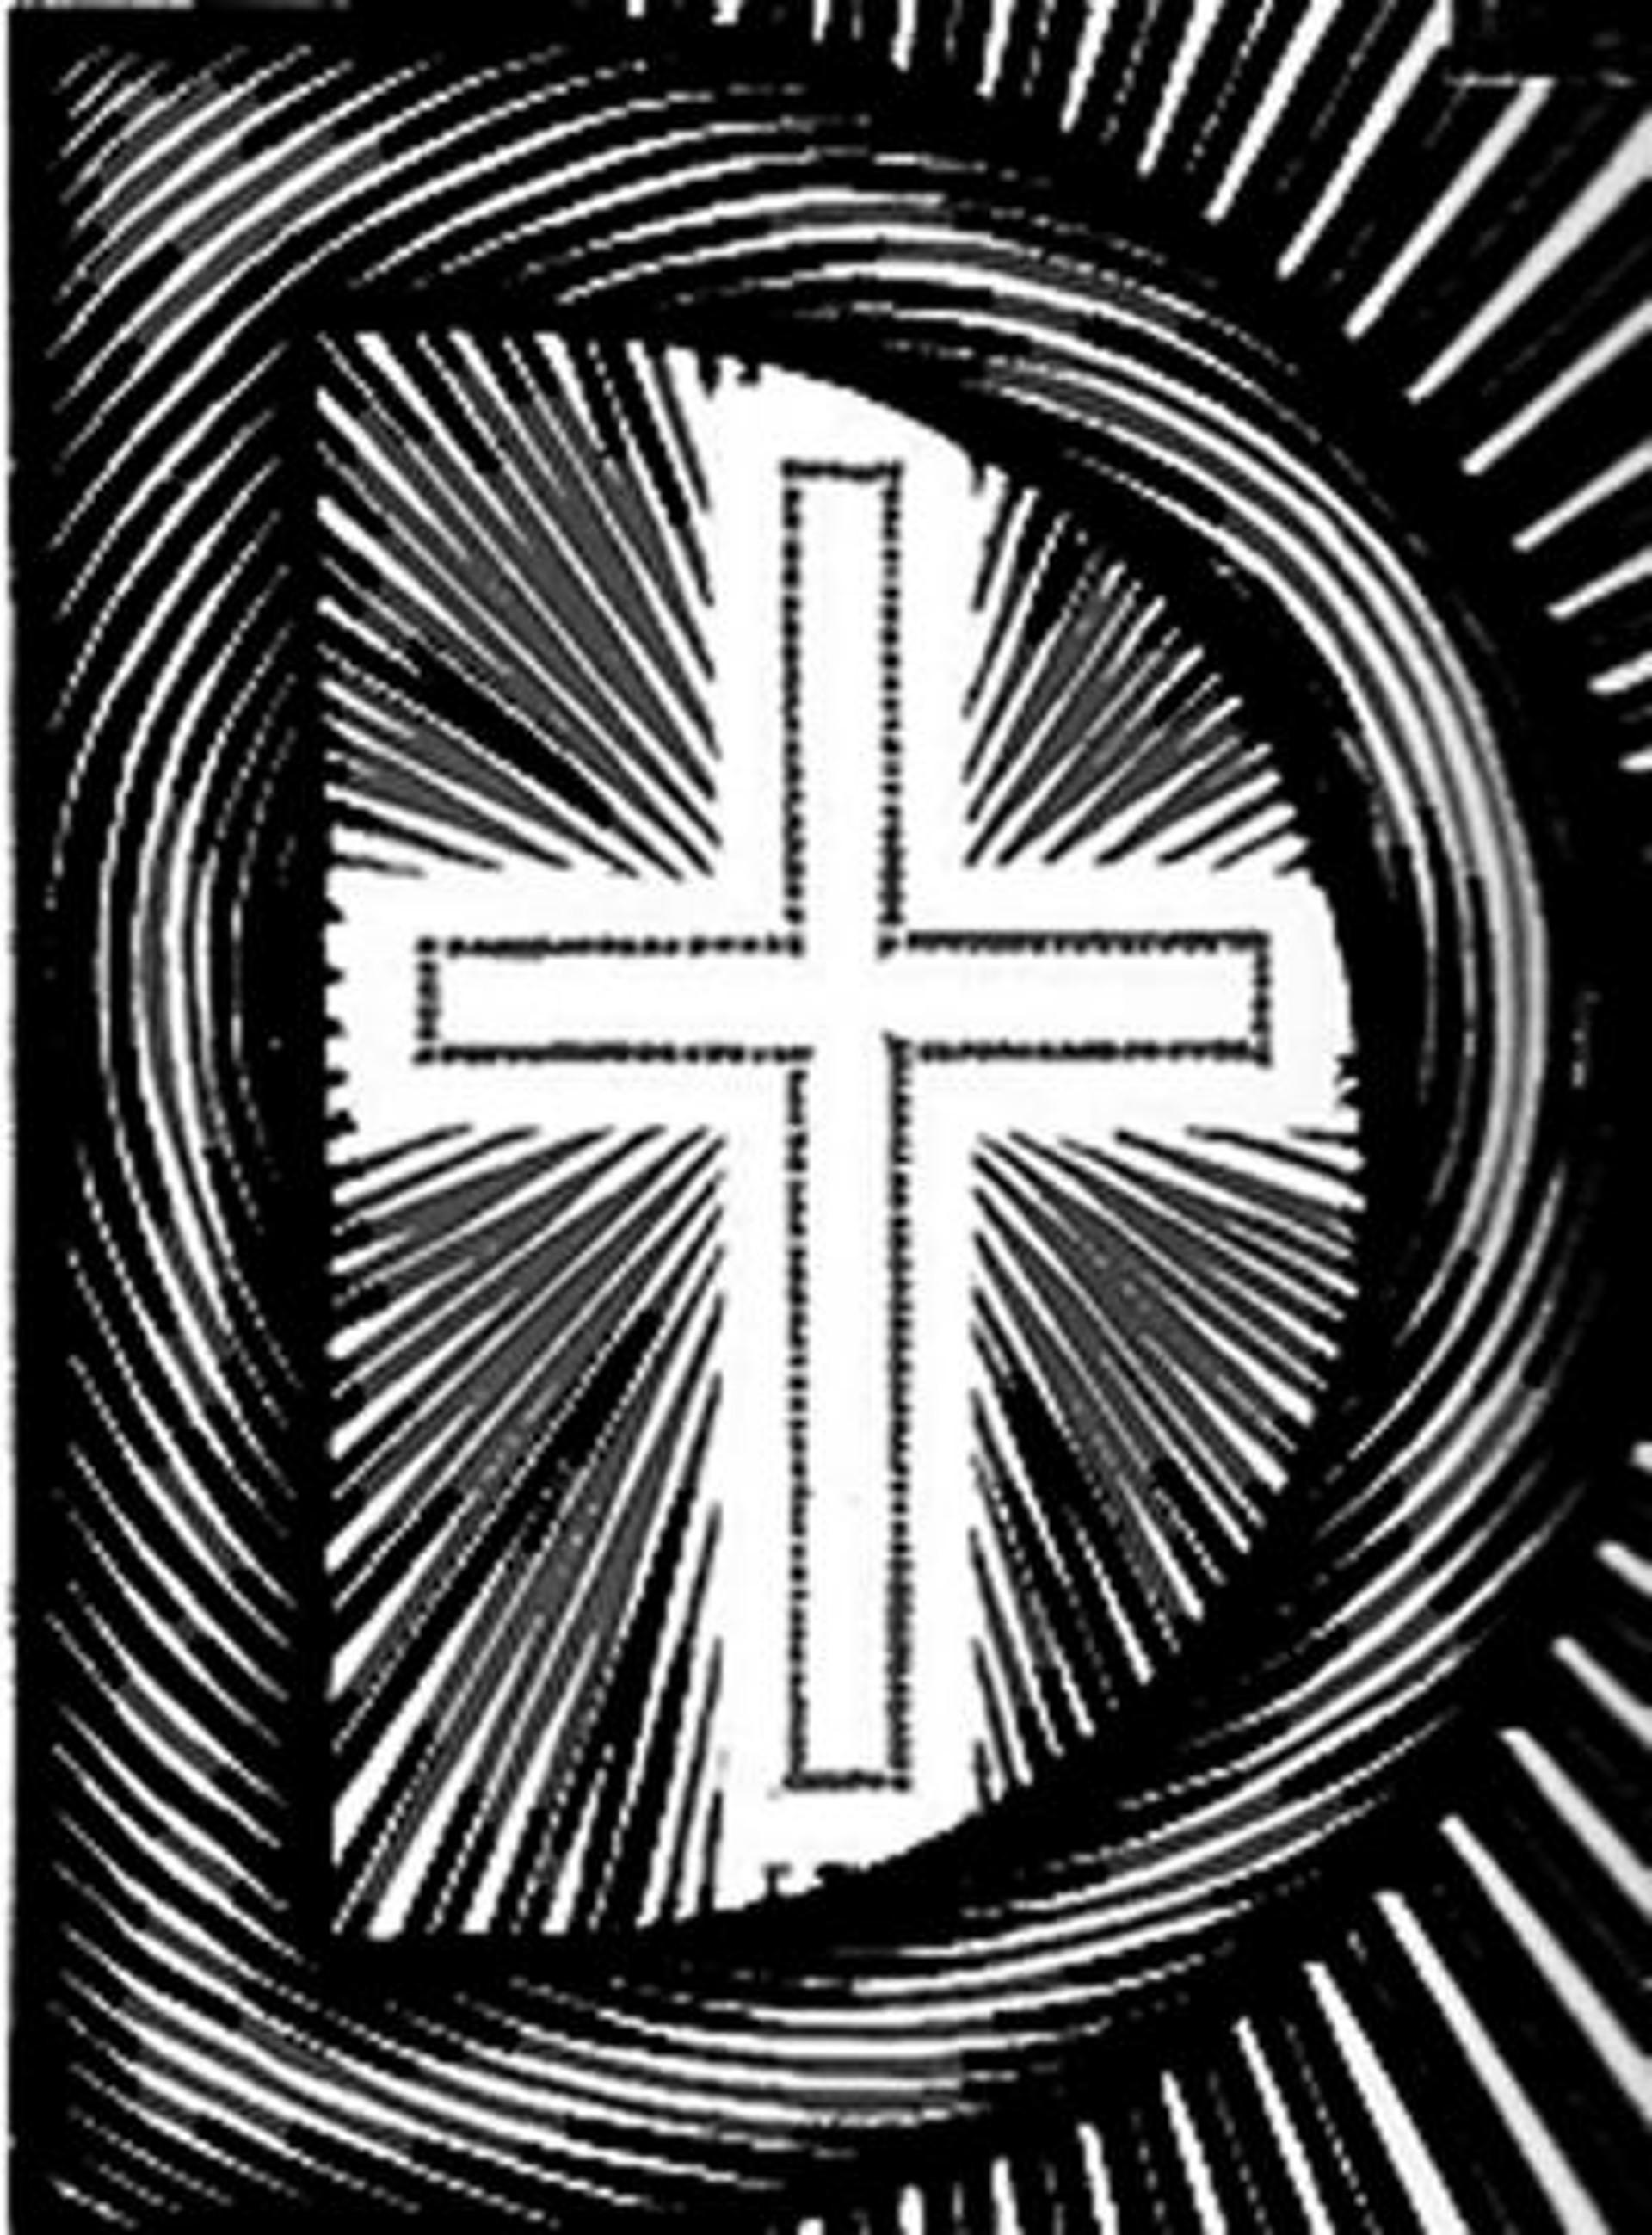 Scholastica - Initial D by M.C. Escher